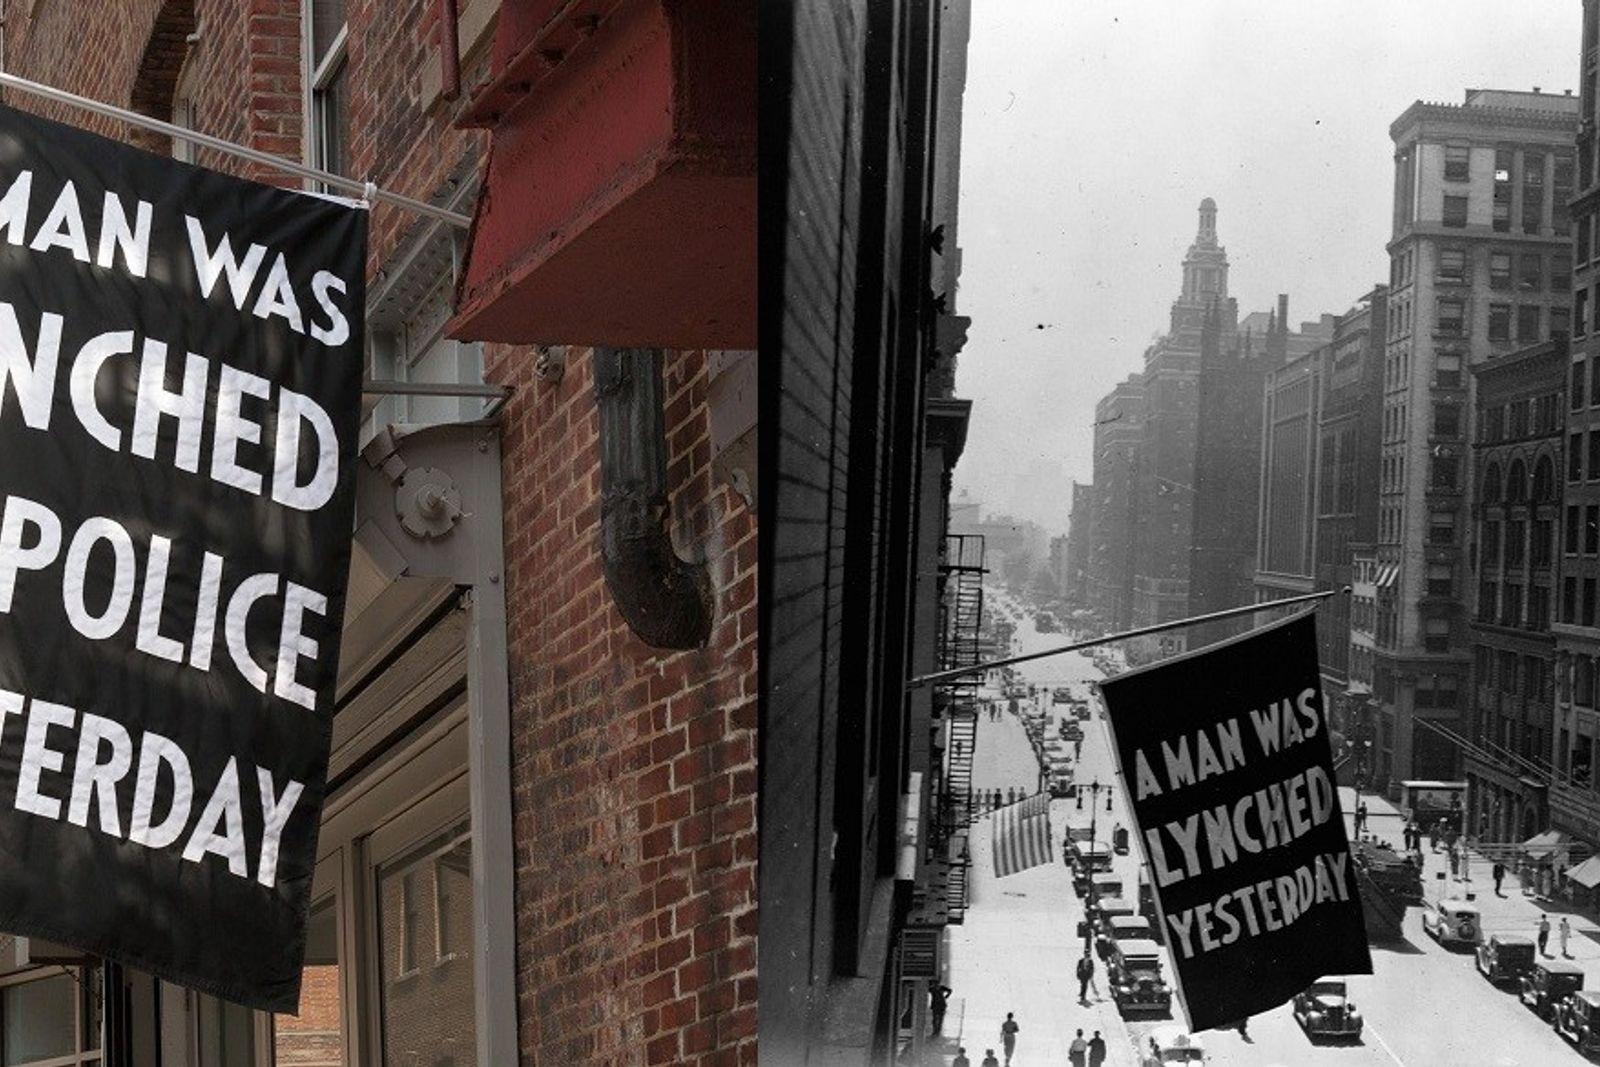 Left:Von 1920 bis 1938 ließ die National Association for the Advancement of Colored People vor ihrem ...